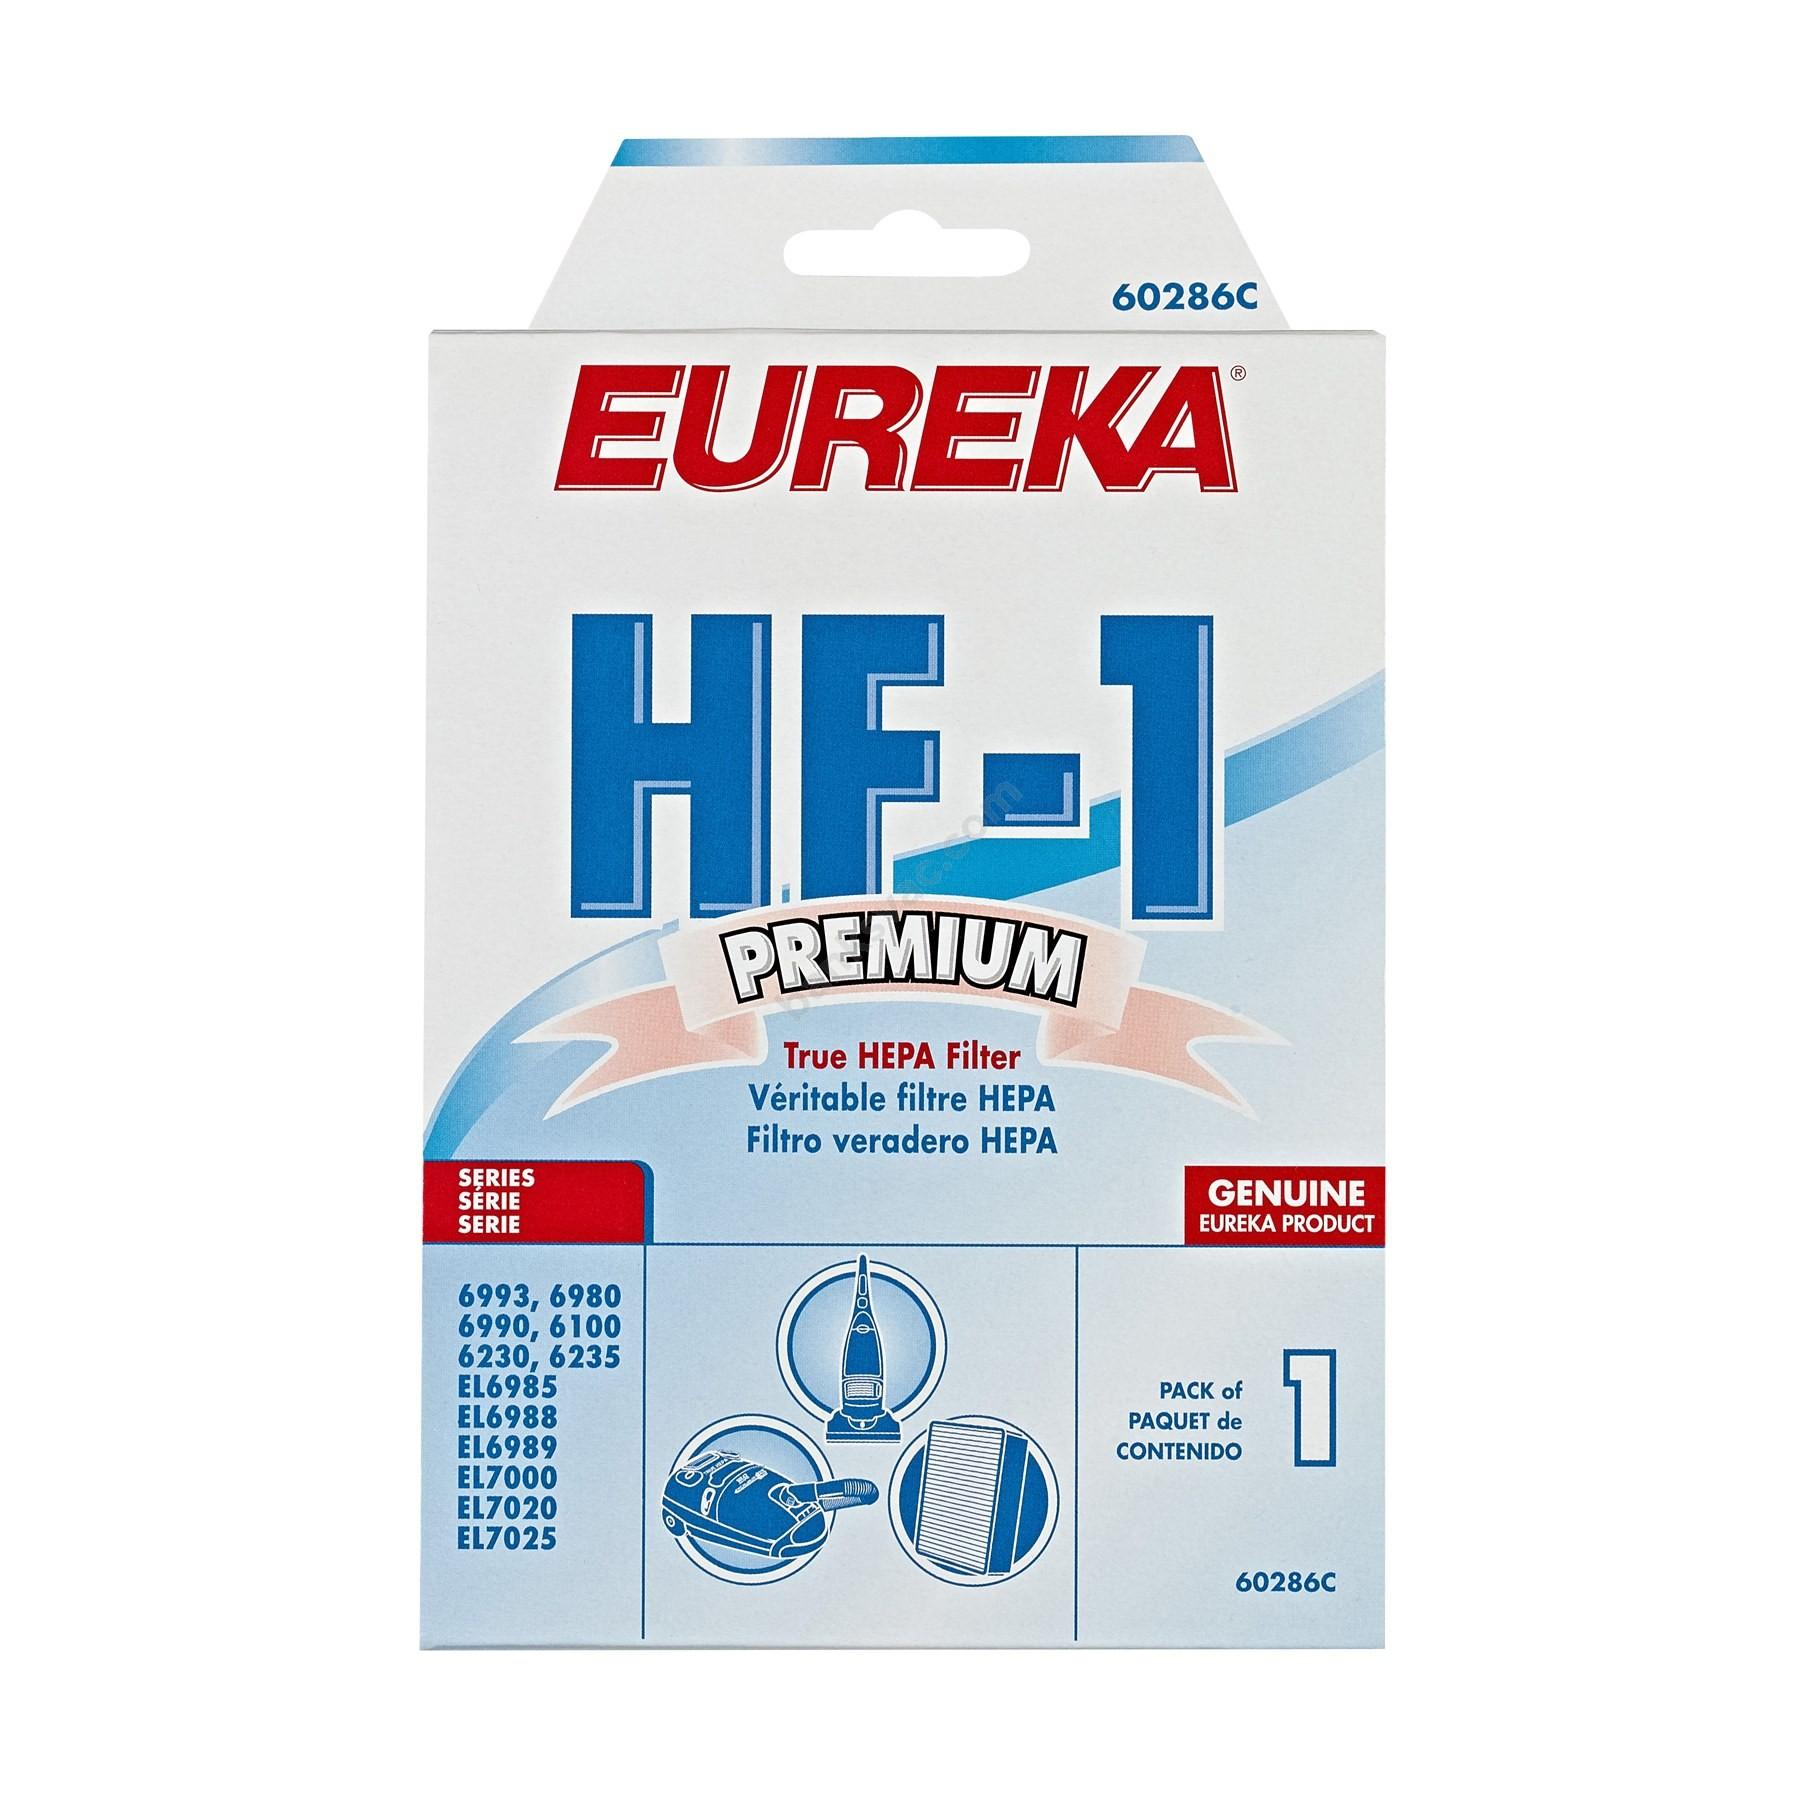 Genuine Eureka HF-1 Filter